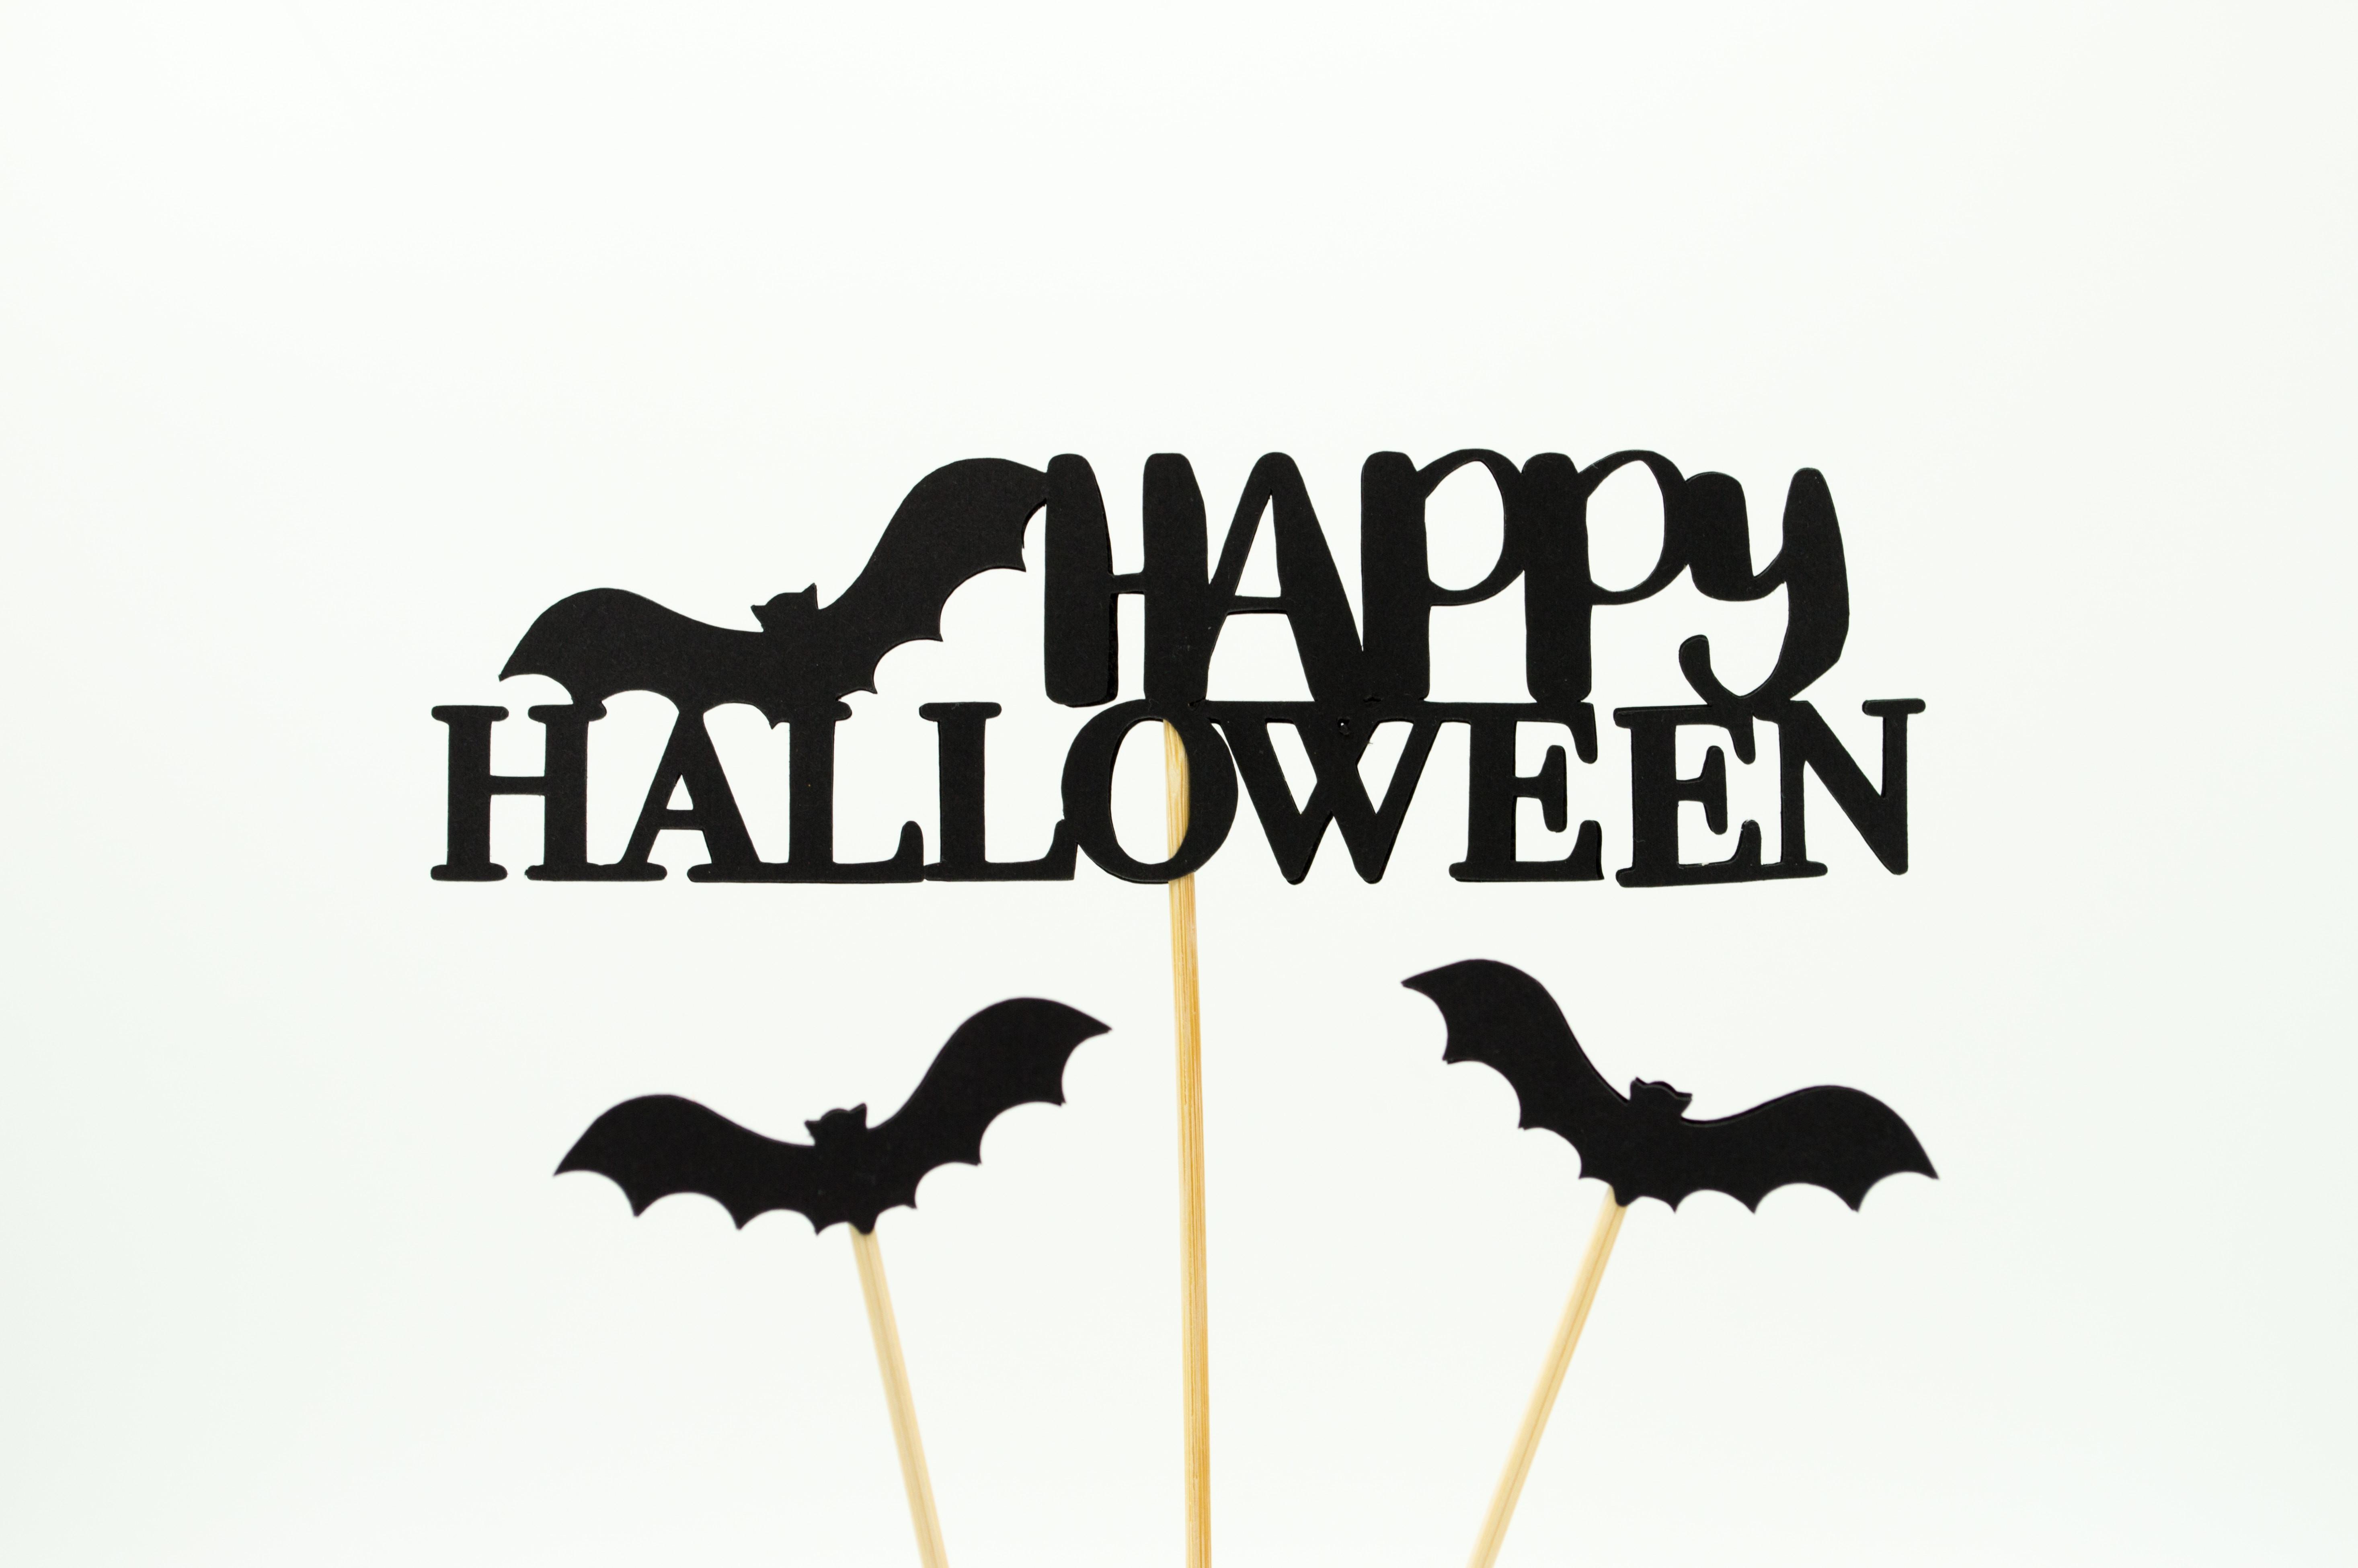 Halloween Spooktacular, 10/31